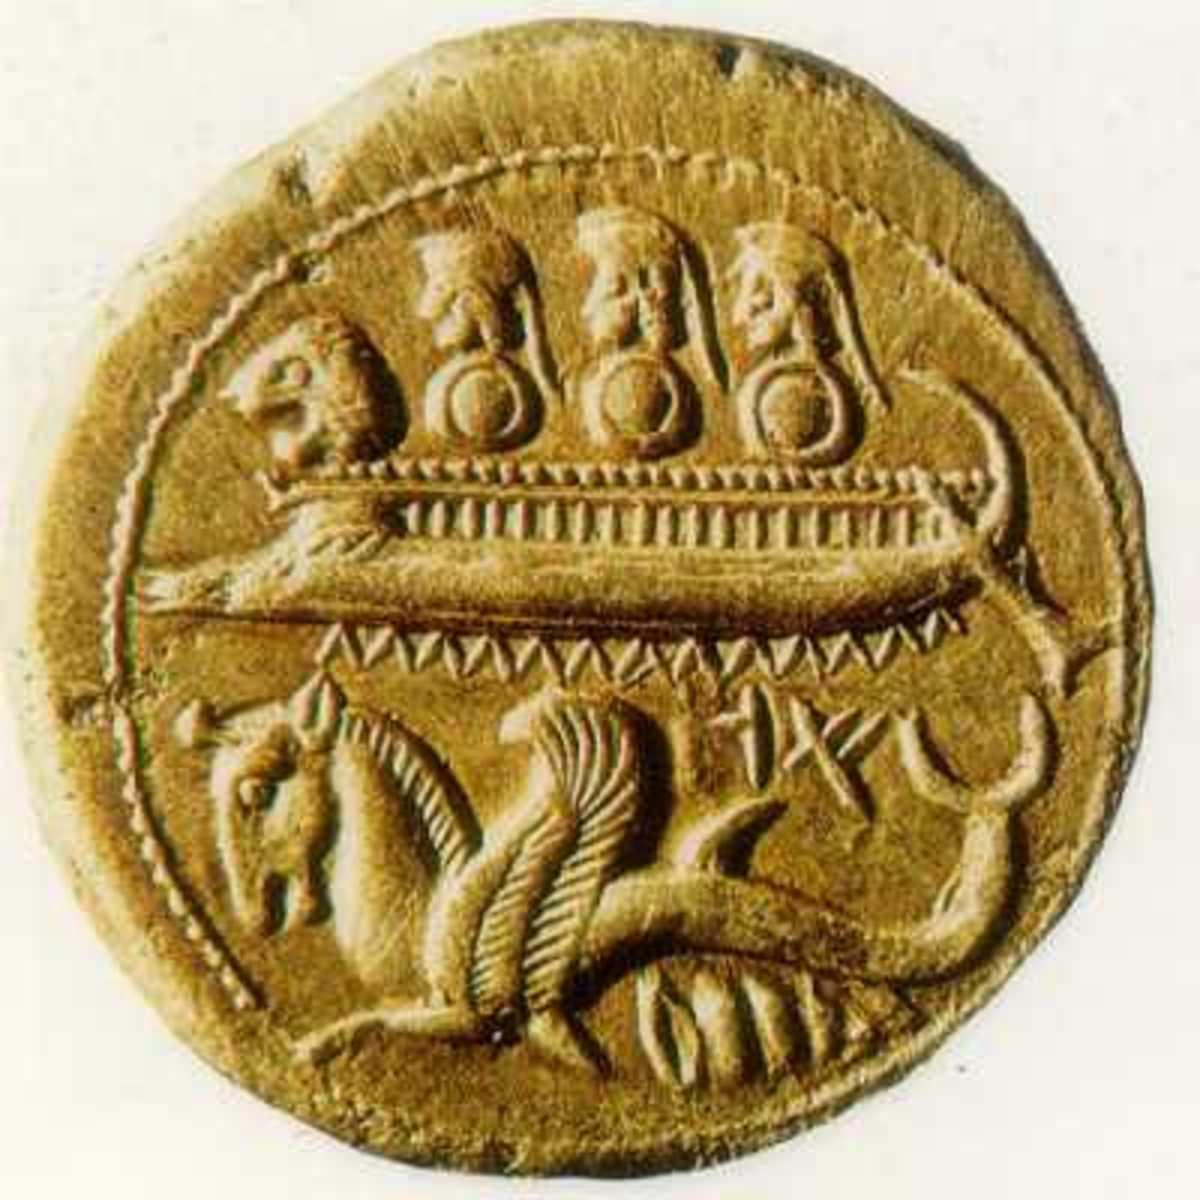 An Ancient Phoenician Coin